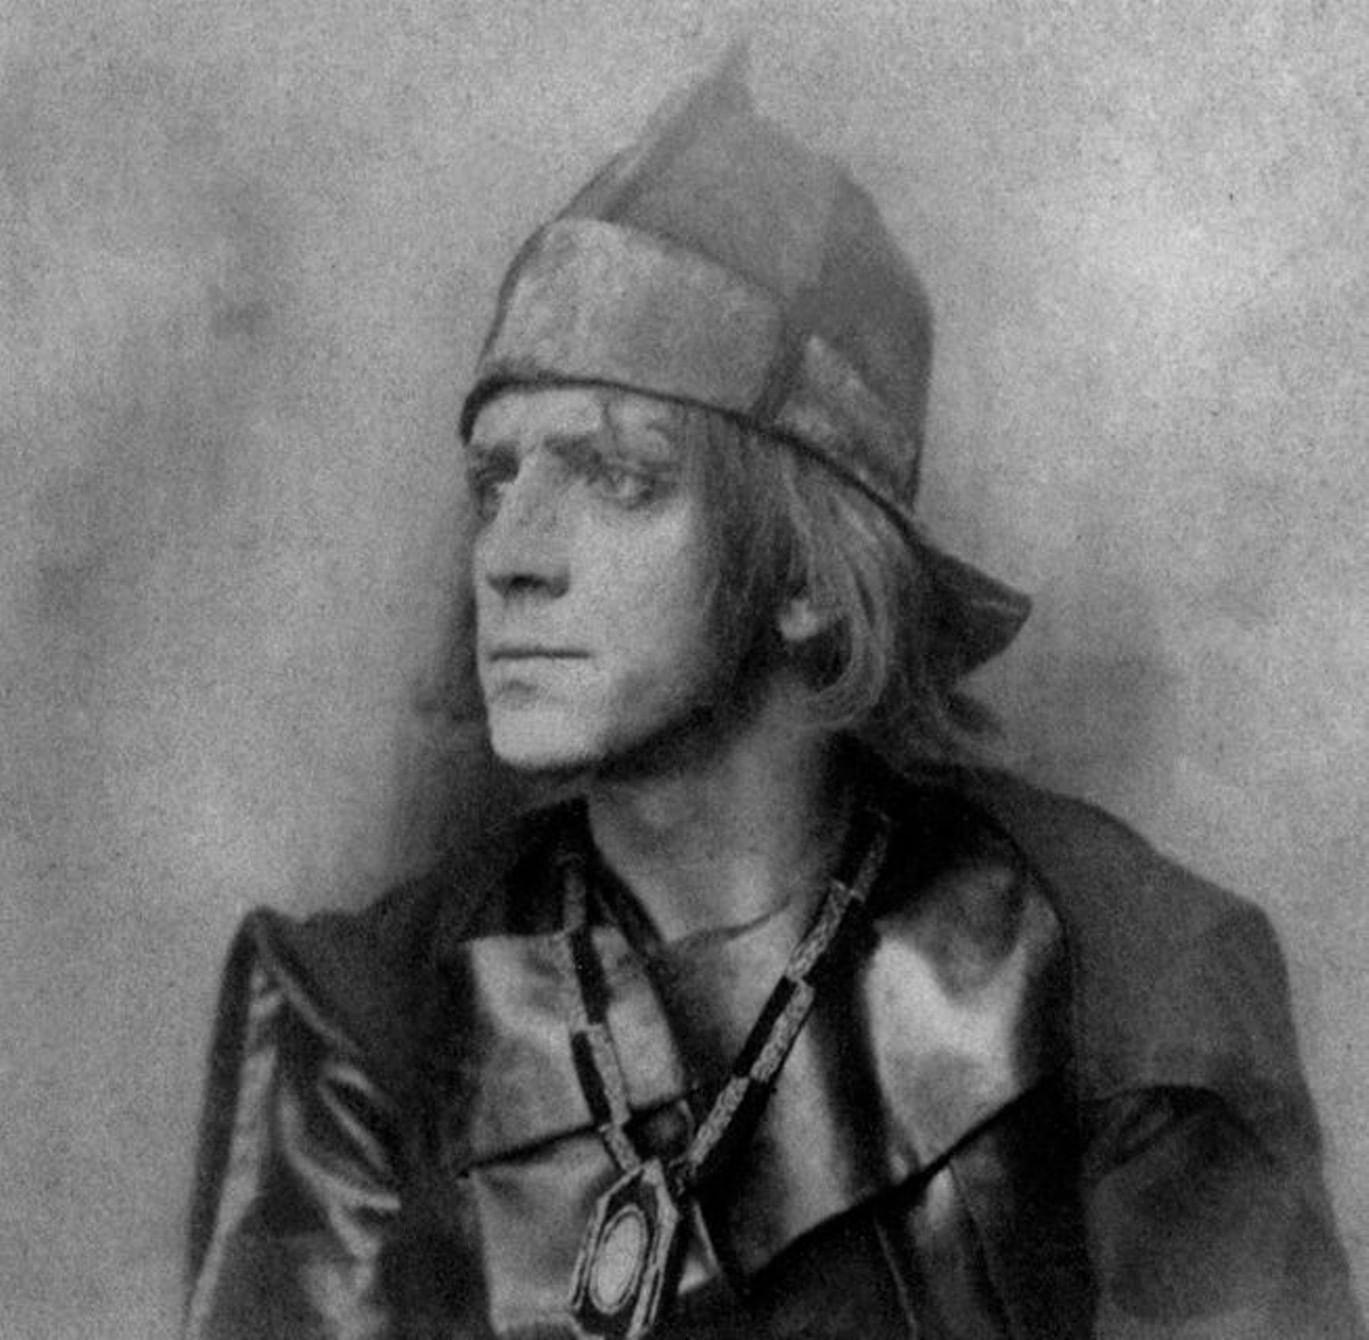 Михаил Чехов. Галерея 1